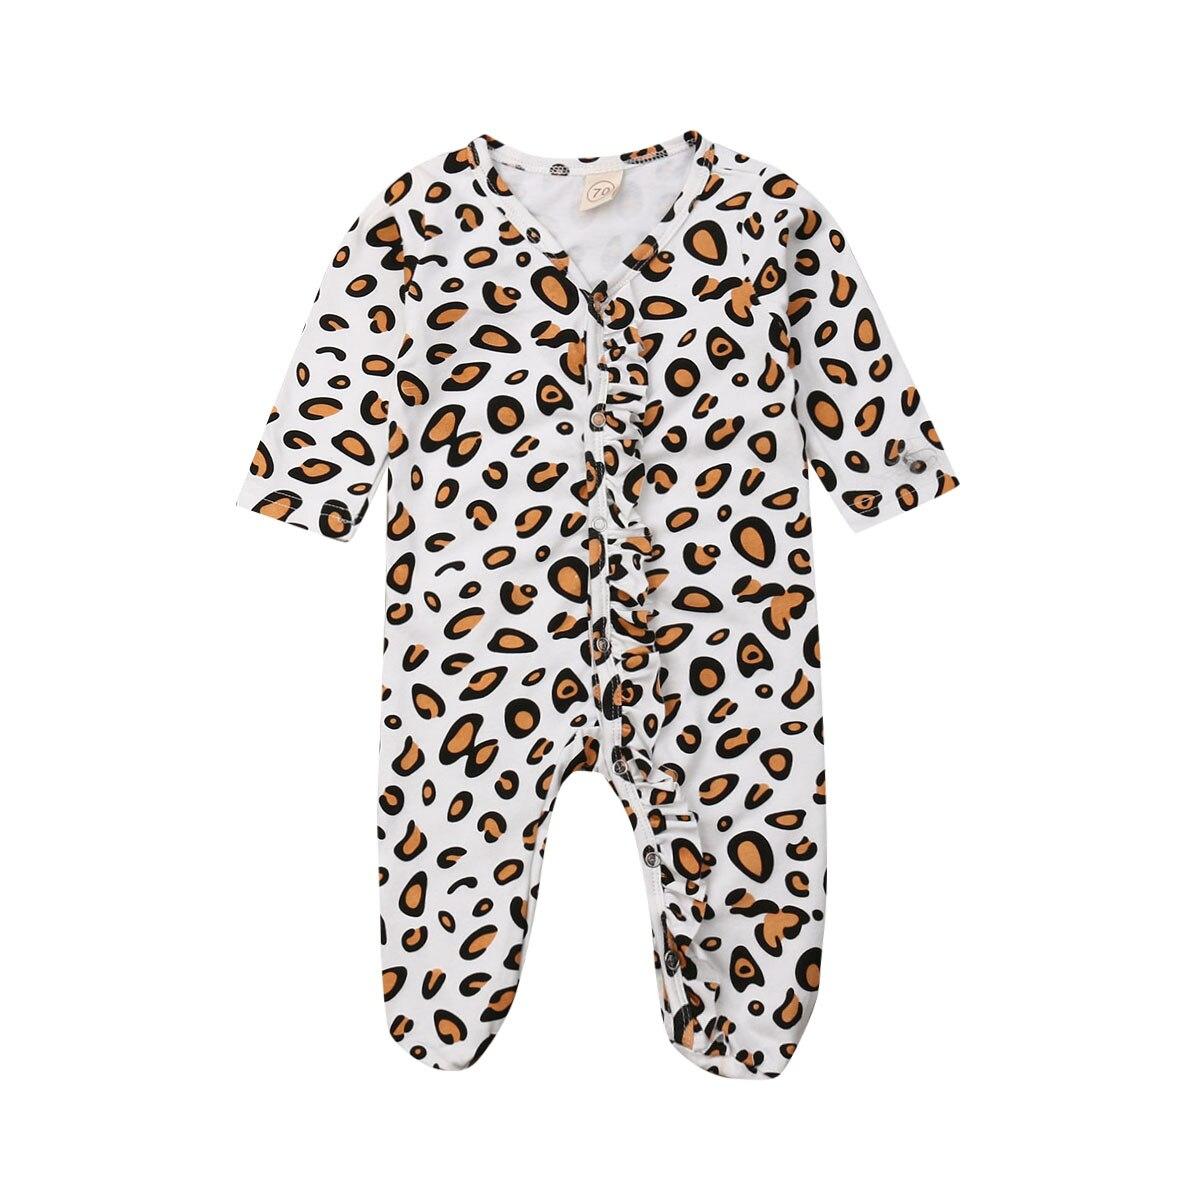 Newborn Infant Baby Girls Clothing Long Sleeve Footies Leopard  Ruffles Baby Girls Costumes